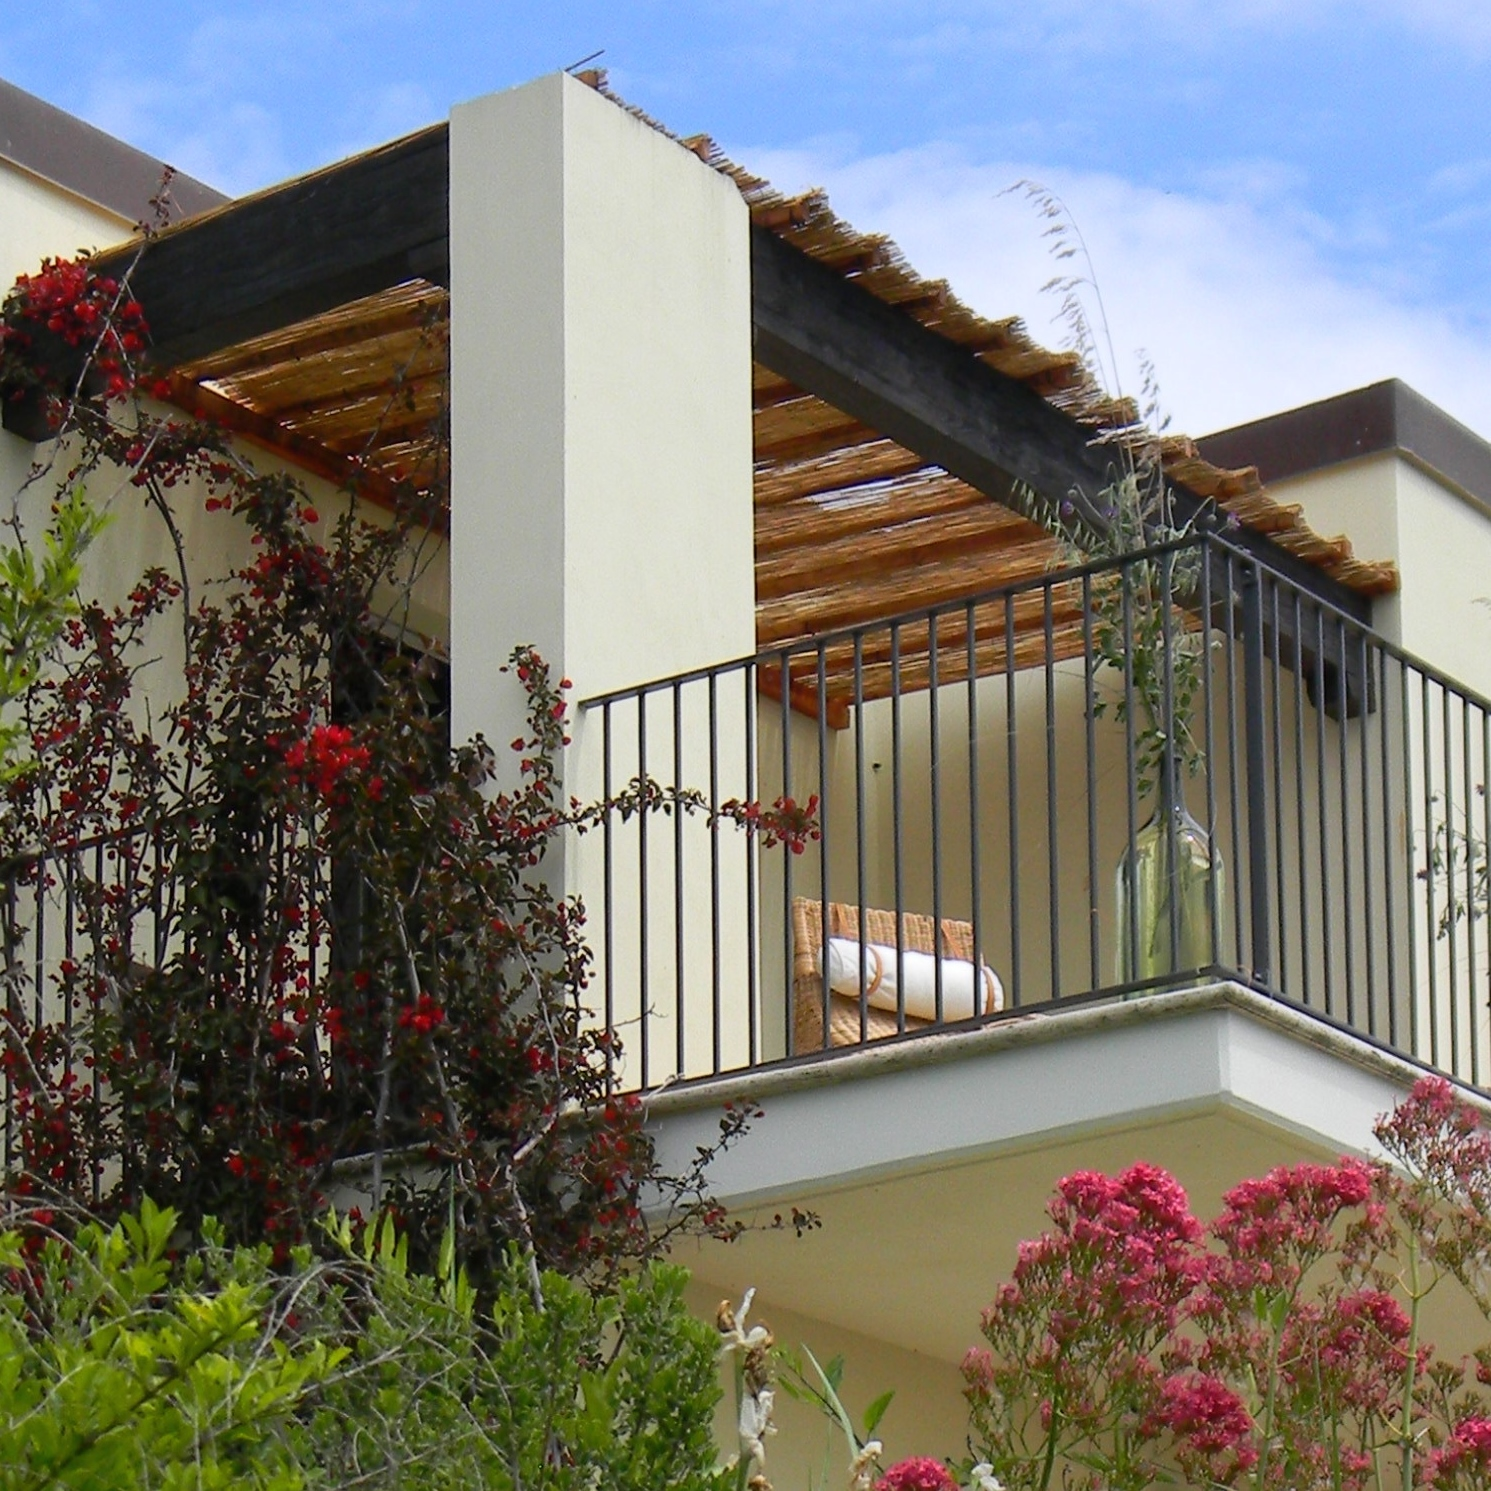 Casa Bardella - Sleeps 5, San Vito/Ortona